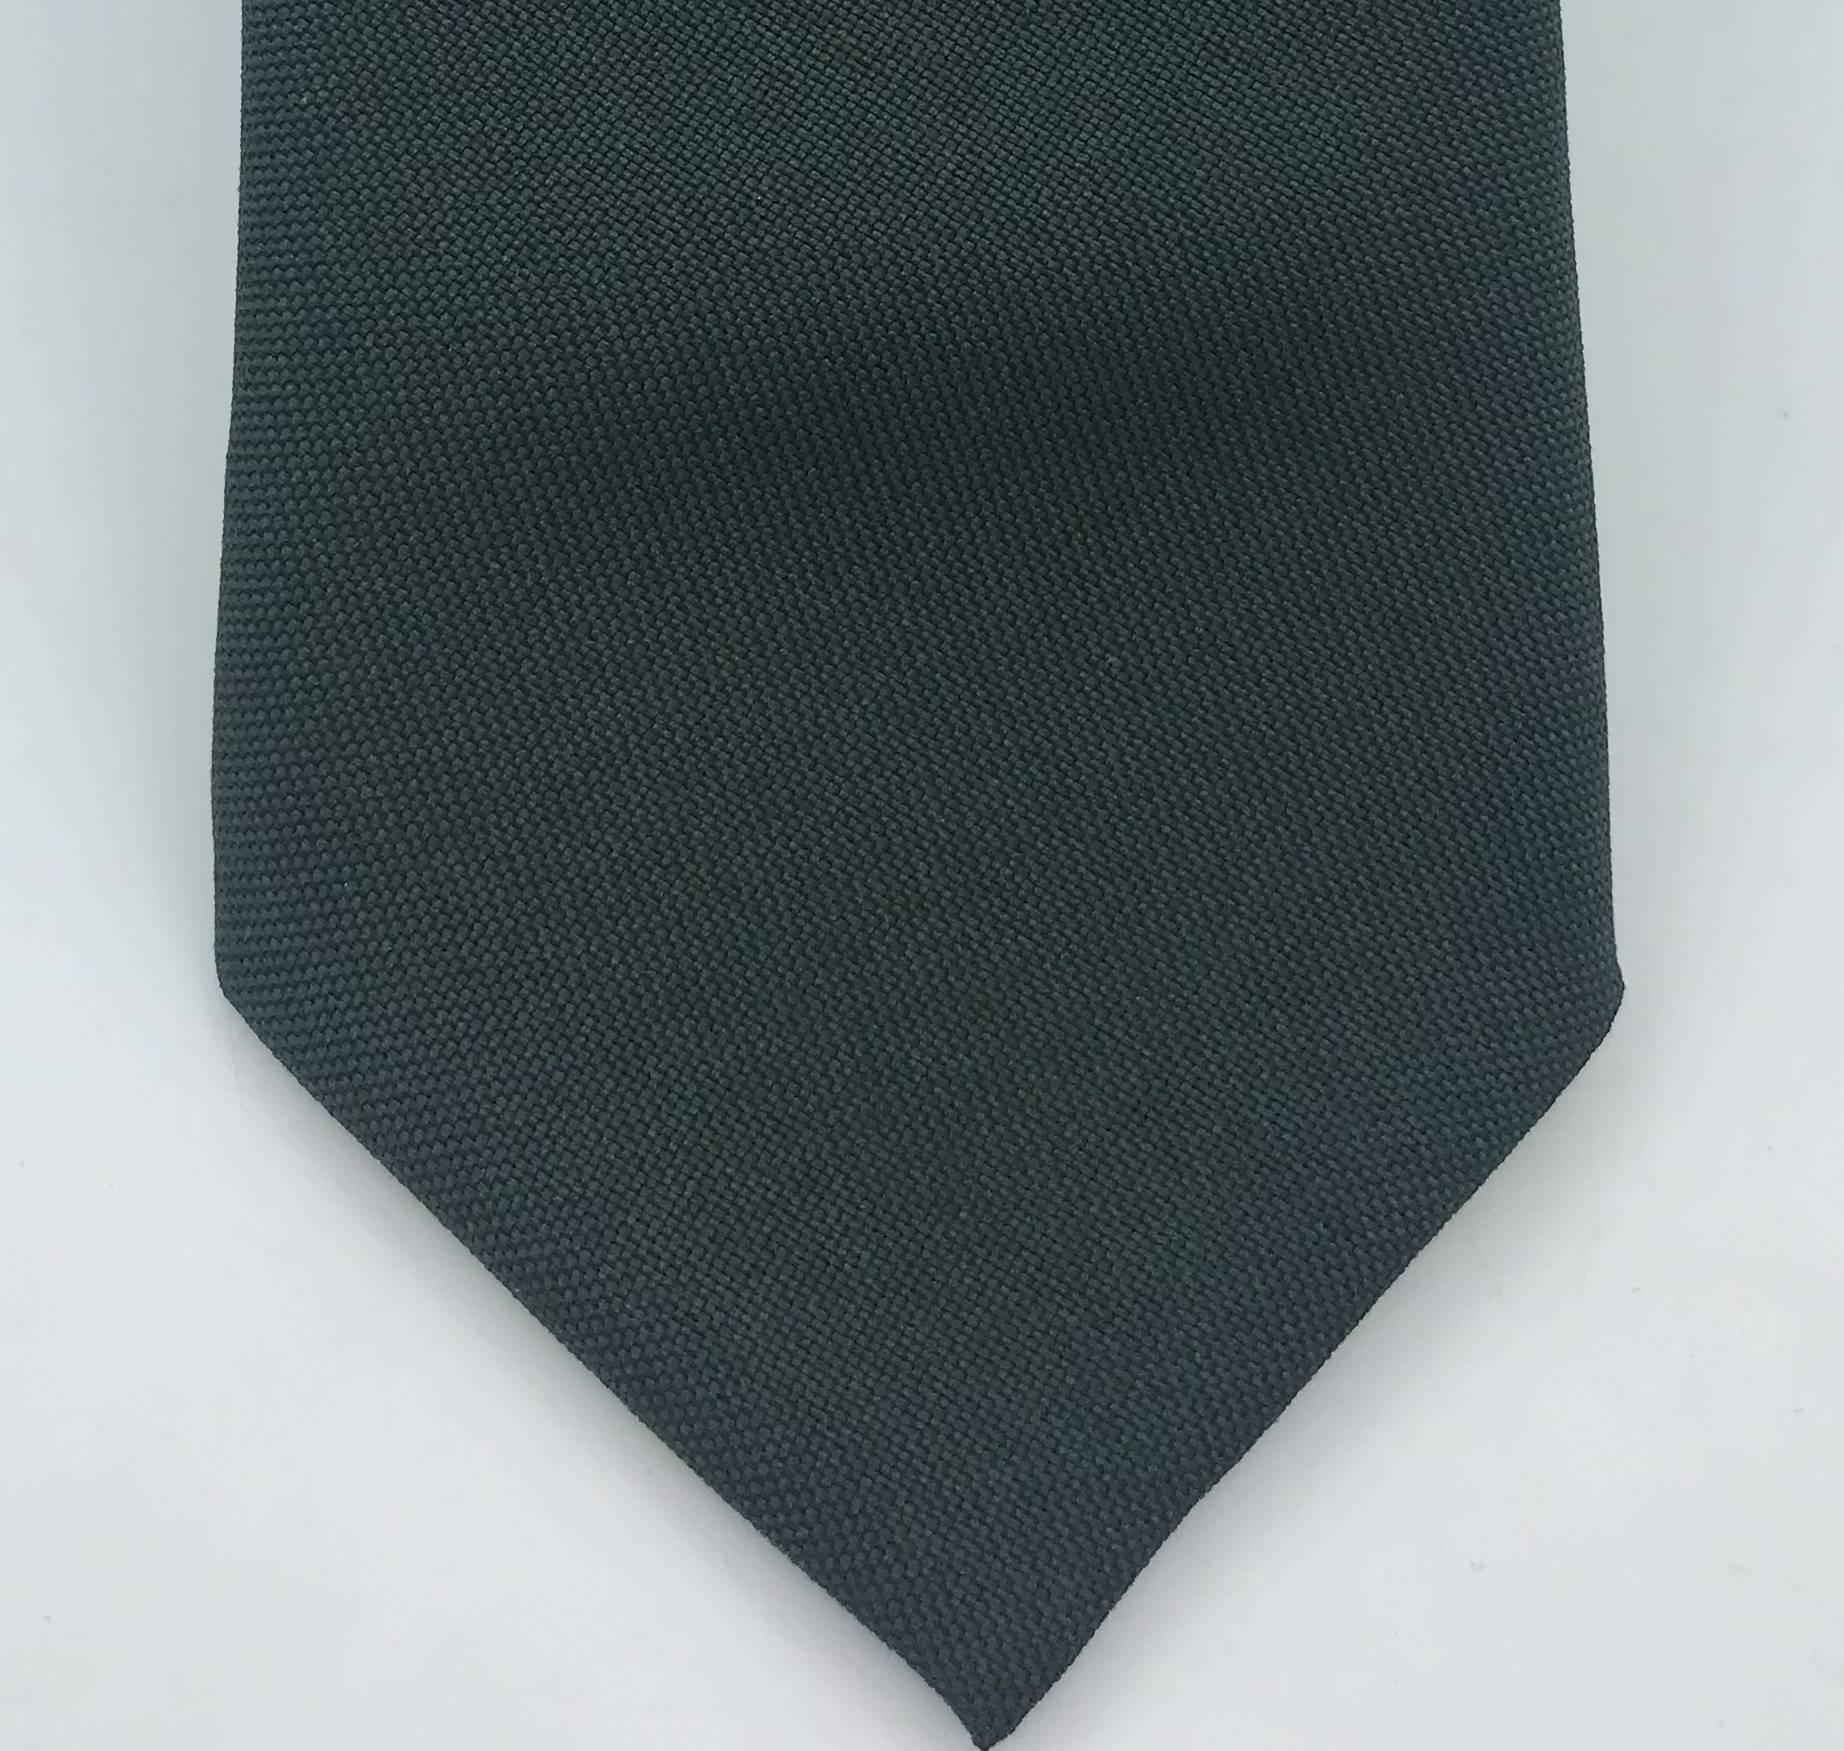 Gravata Semi-Slim Verde Musgo Lisa Fosca